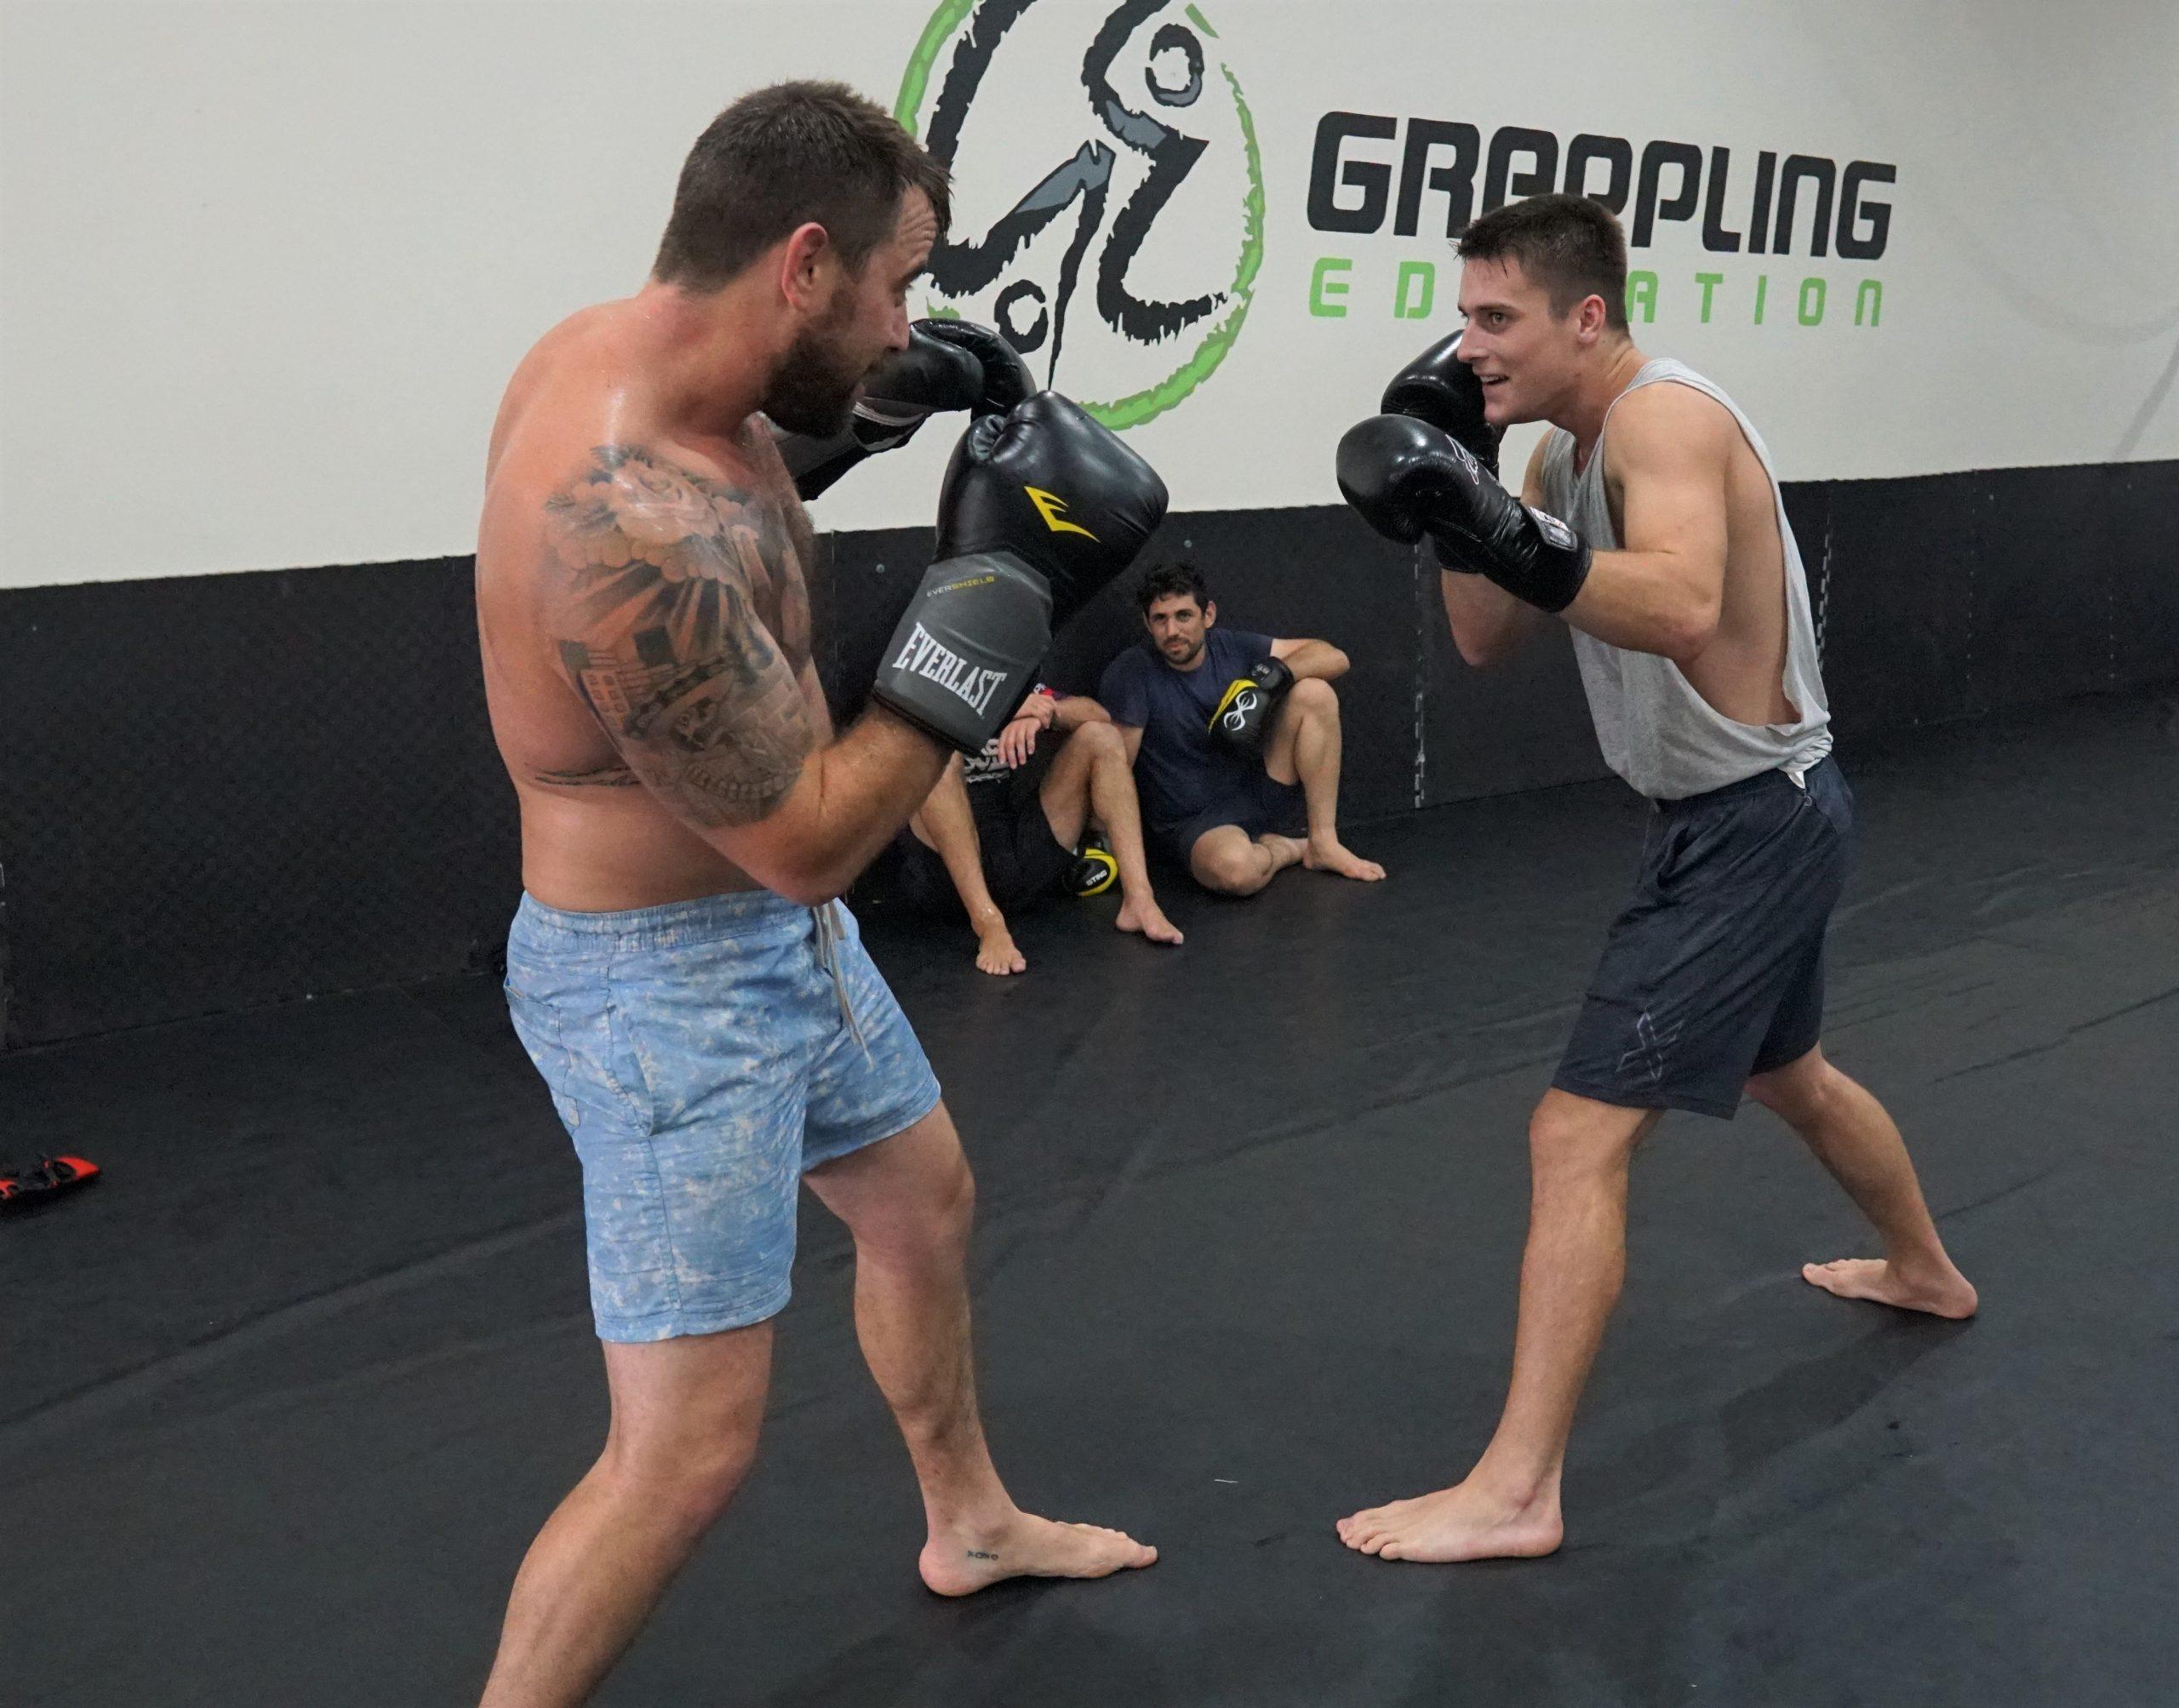 DSC01394 2 scaled MMA